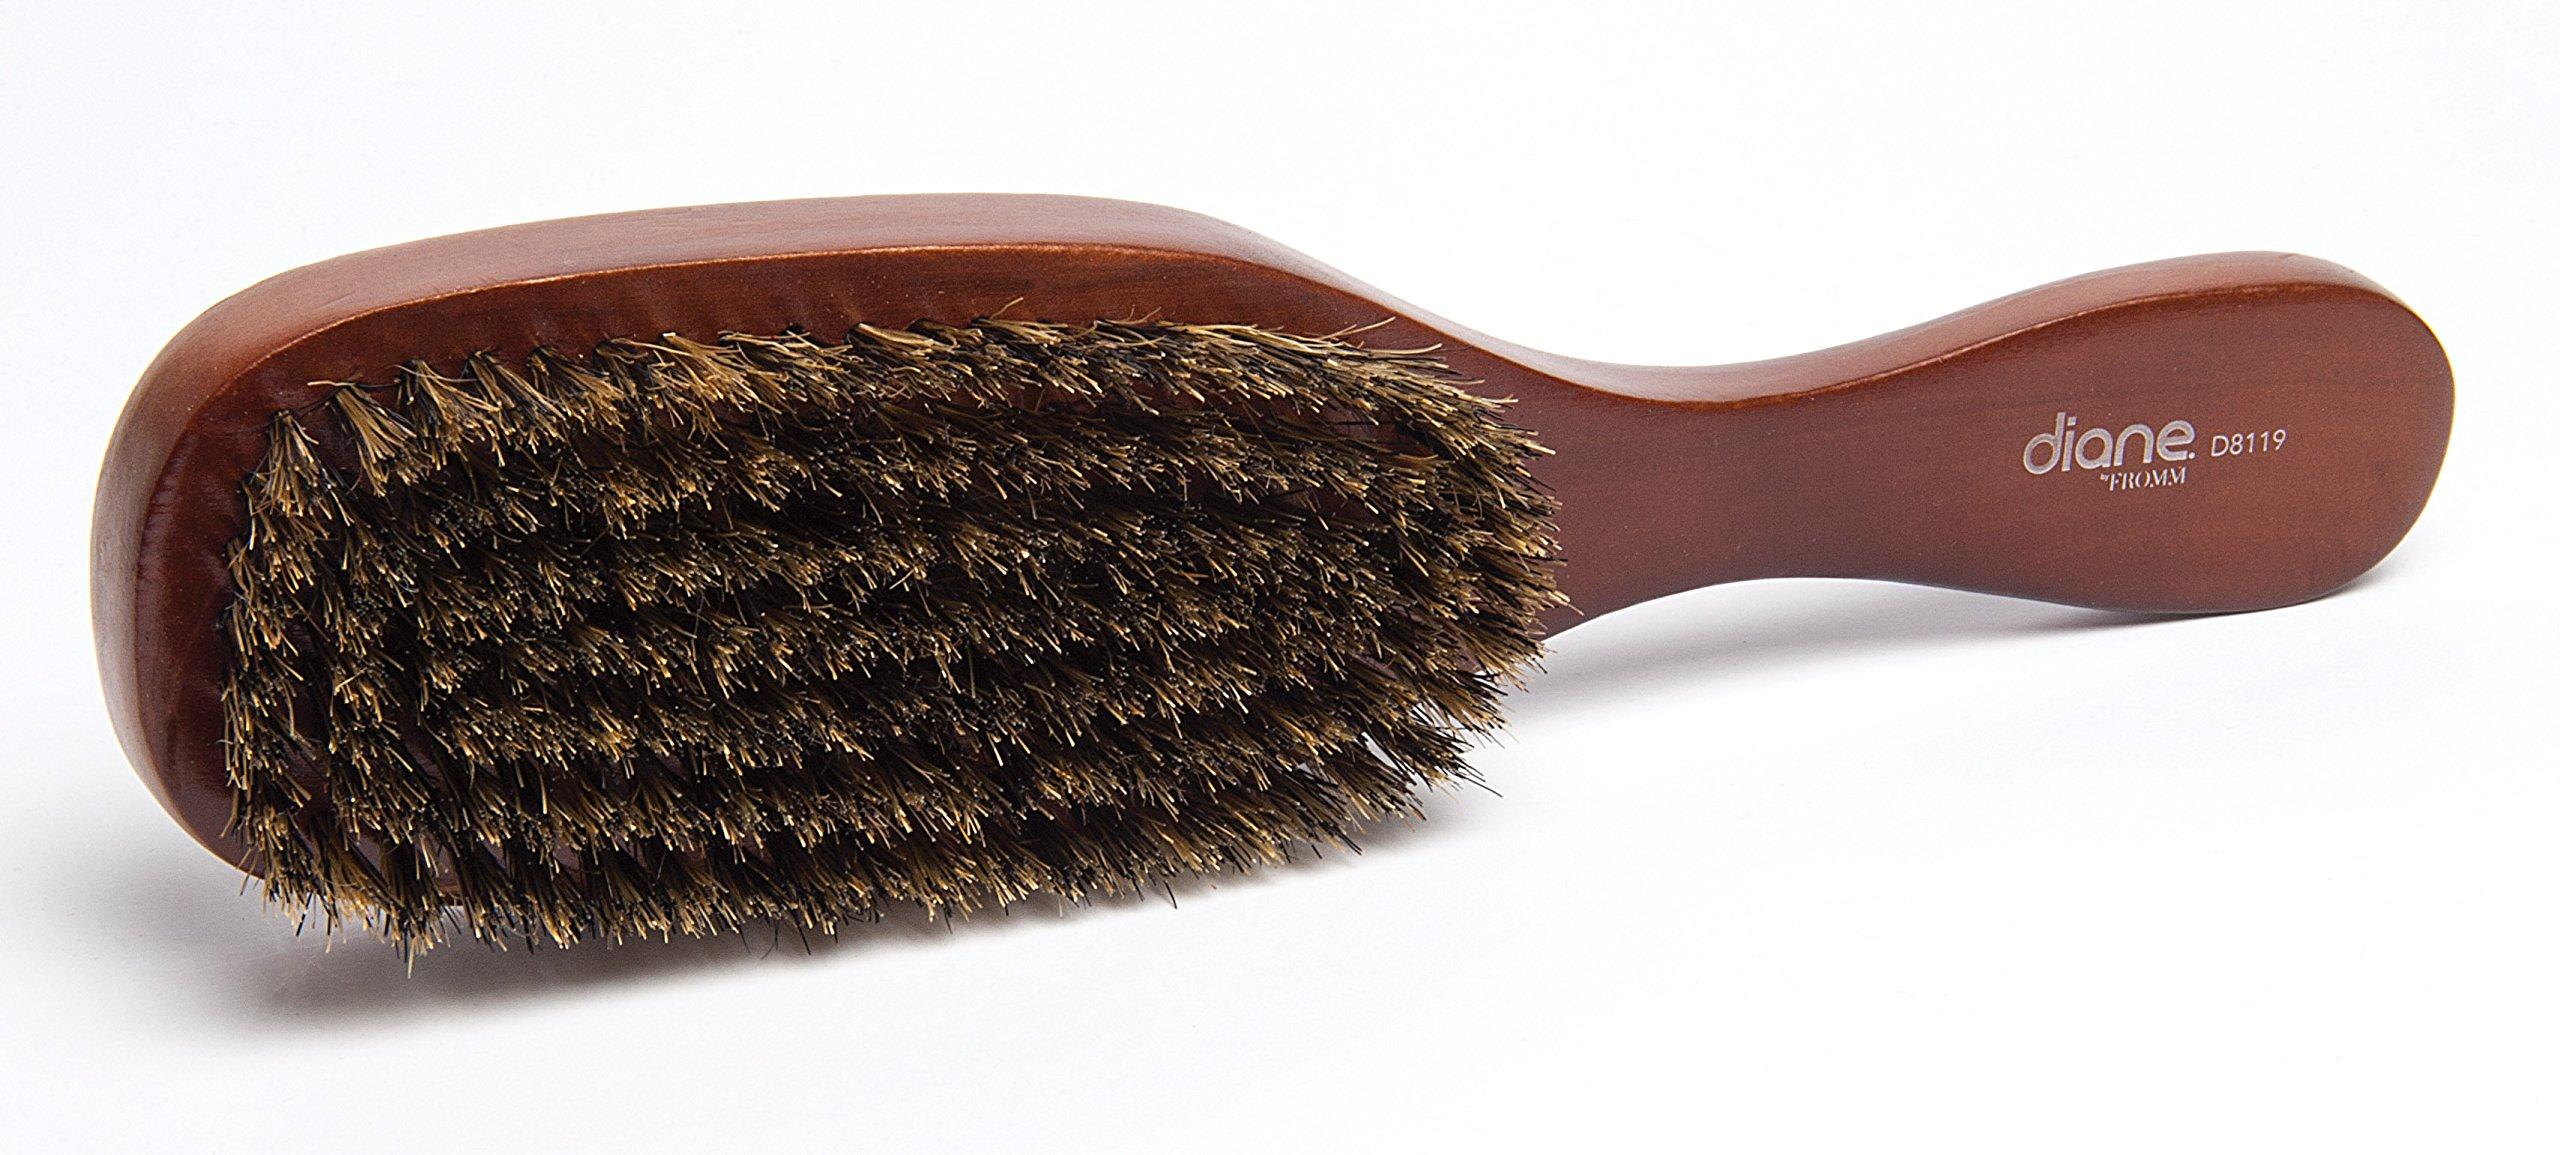 Diane 100% Boar Wave Brush